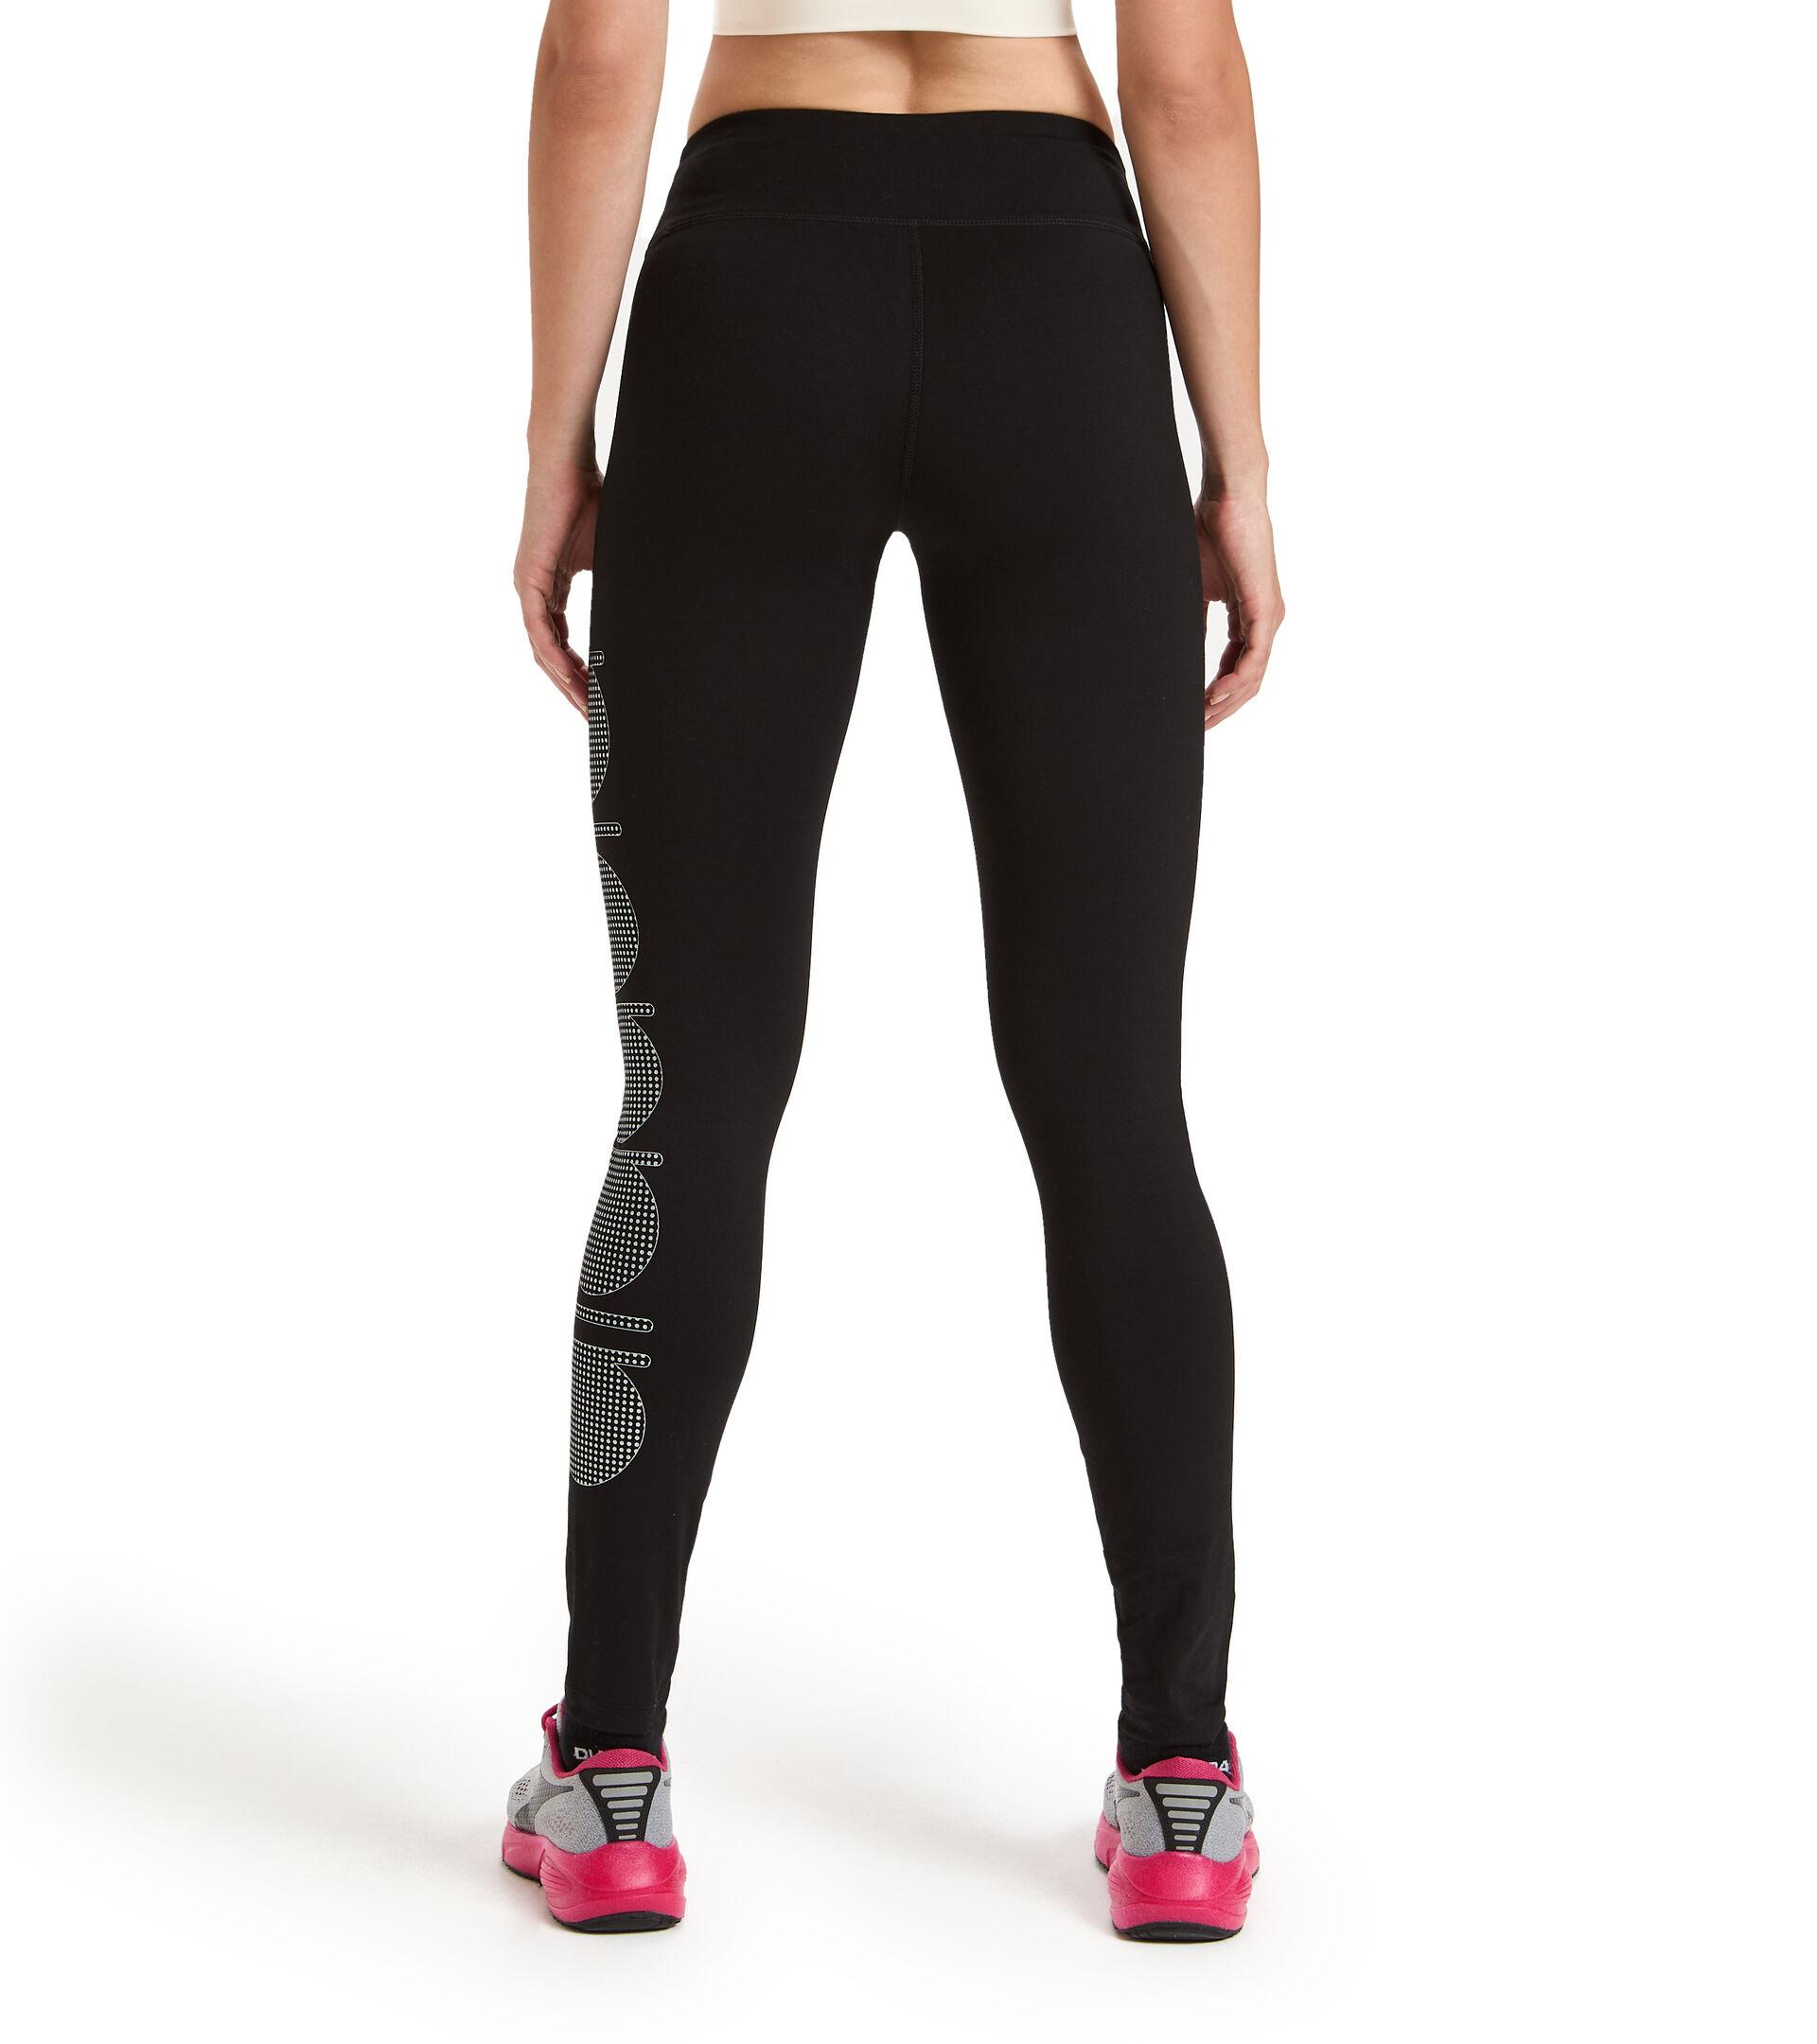 Apparel Sport DONNA L. STC LEGGINGS BE ONE BLACK Diadora